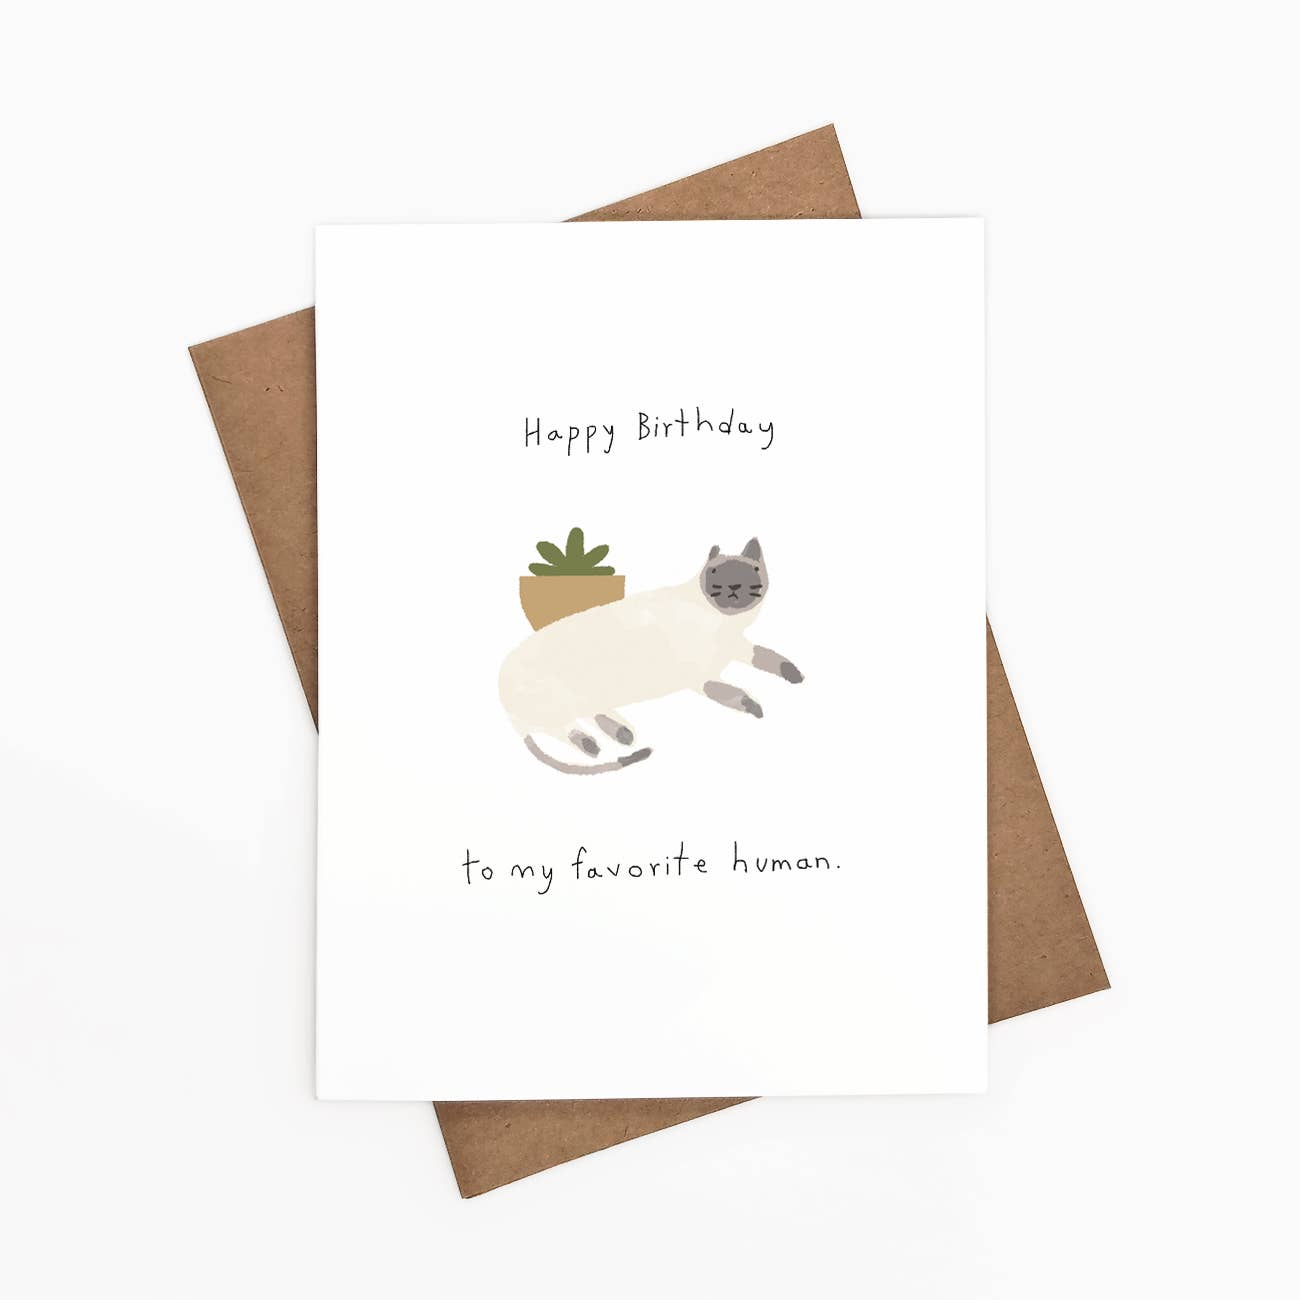 Happy Birthday To My Favorite Human Greeting Card   Trada Marketplace